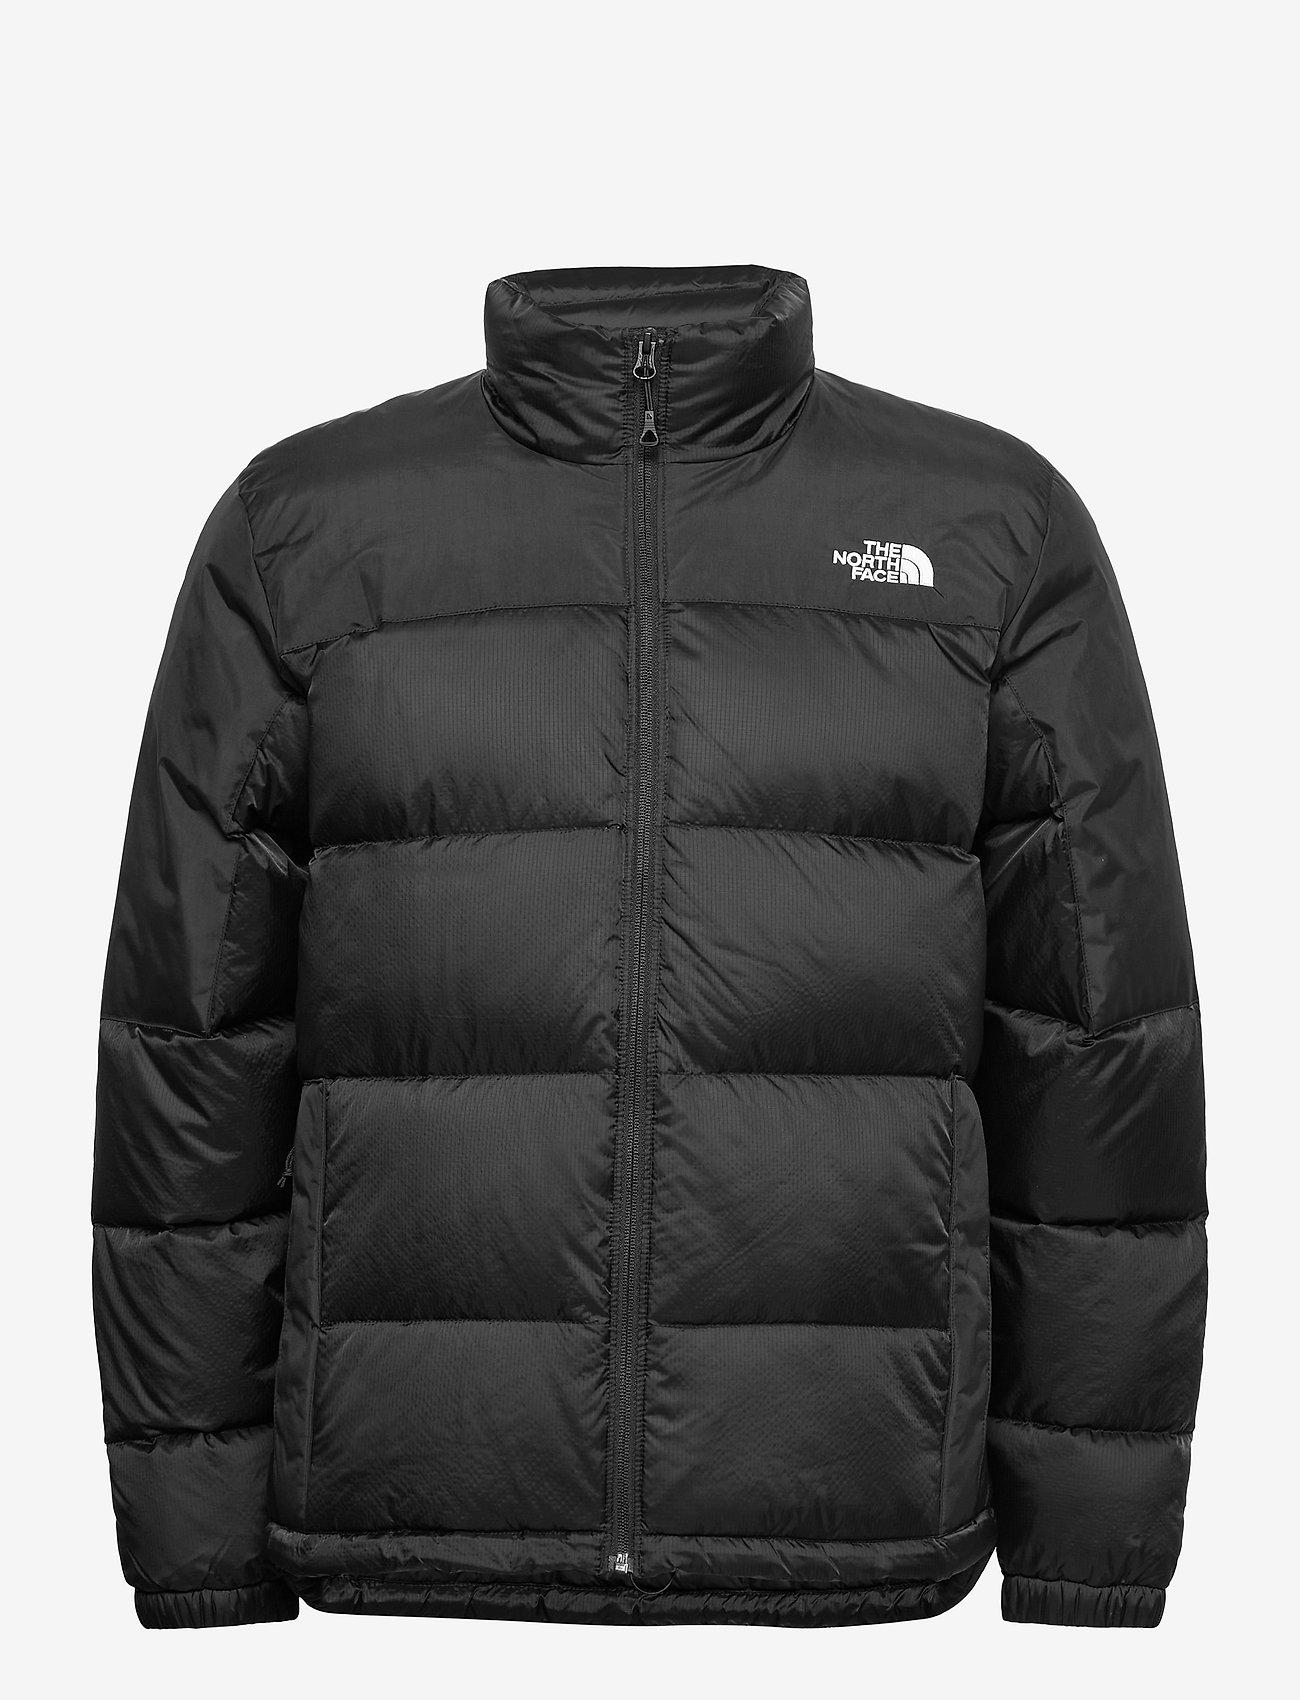 The North Face - M DIABLO DWN JKT - vestes matelassées - tnf black-tnf black - 0